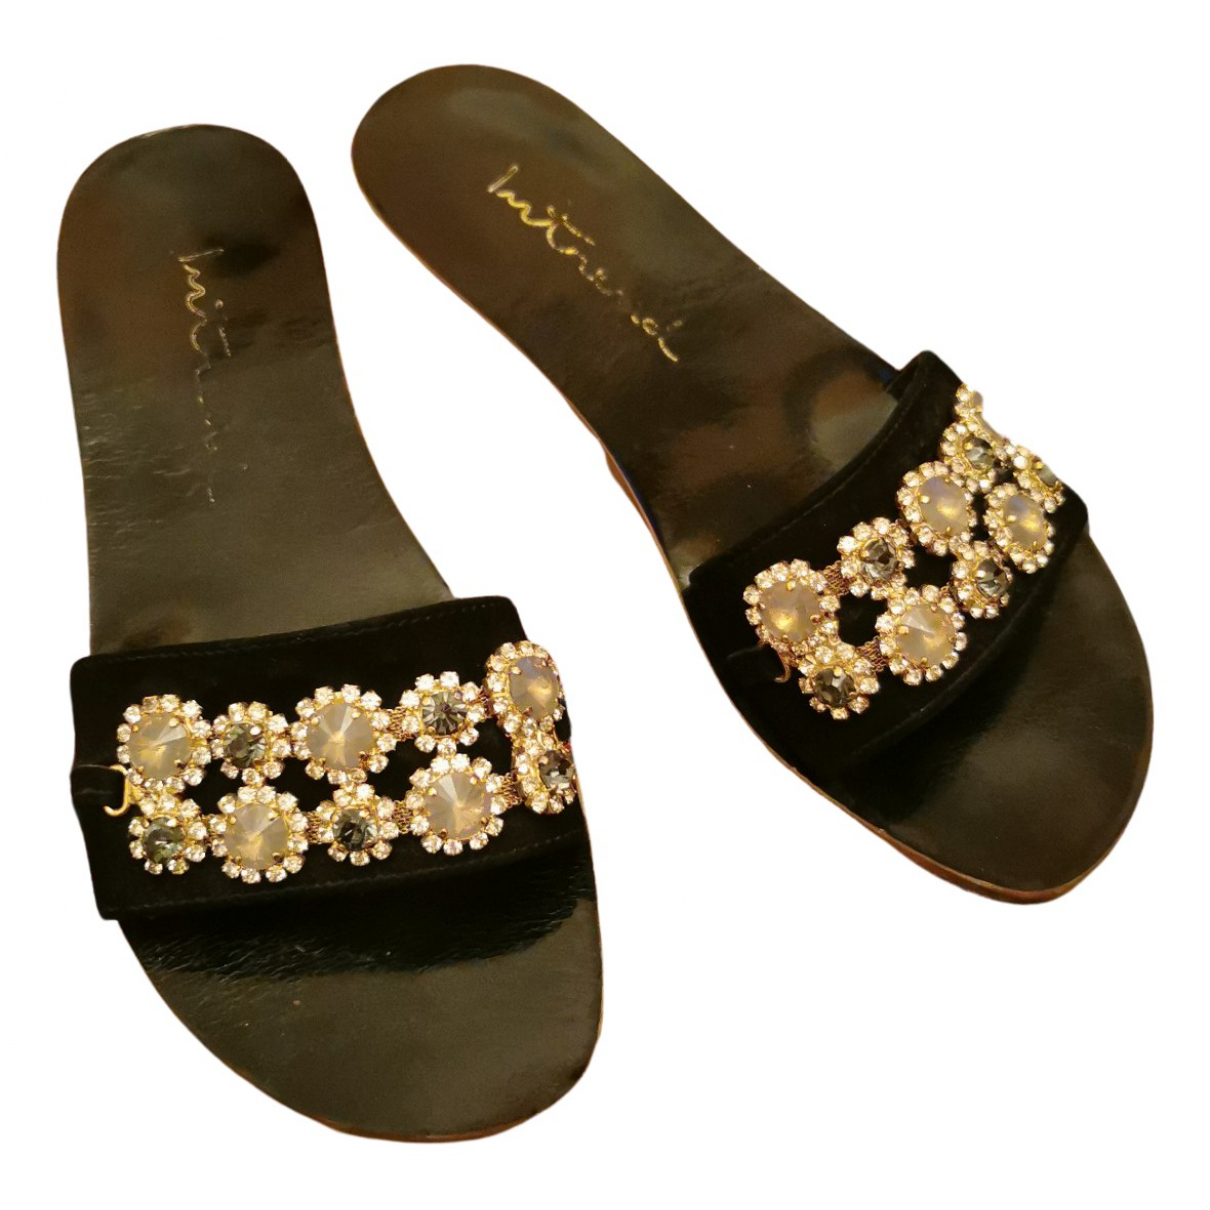 Intrend N Black Suede Sandals for Women 37 EU